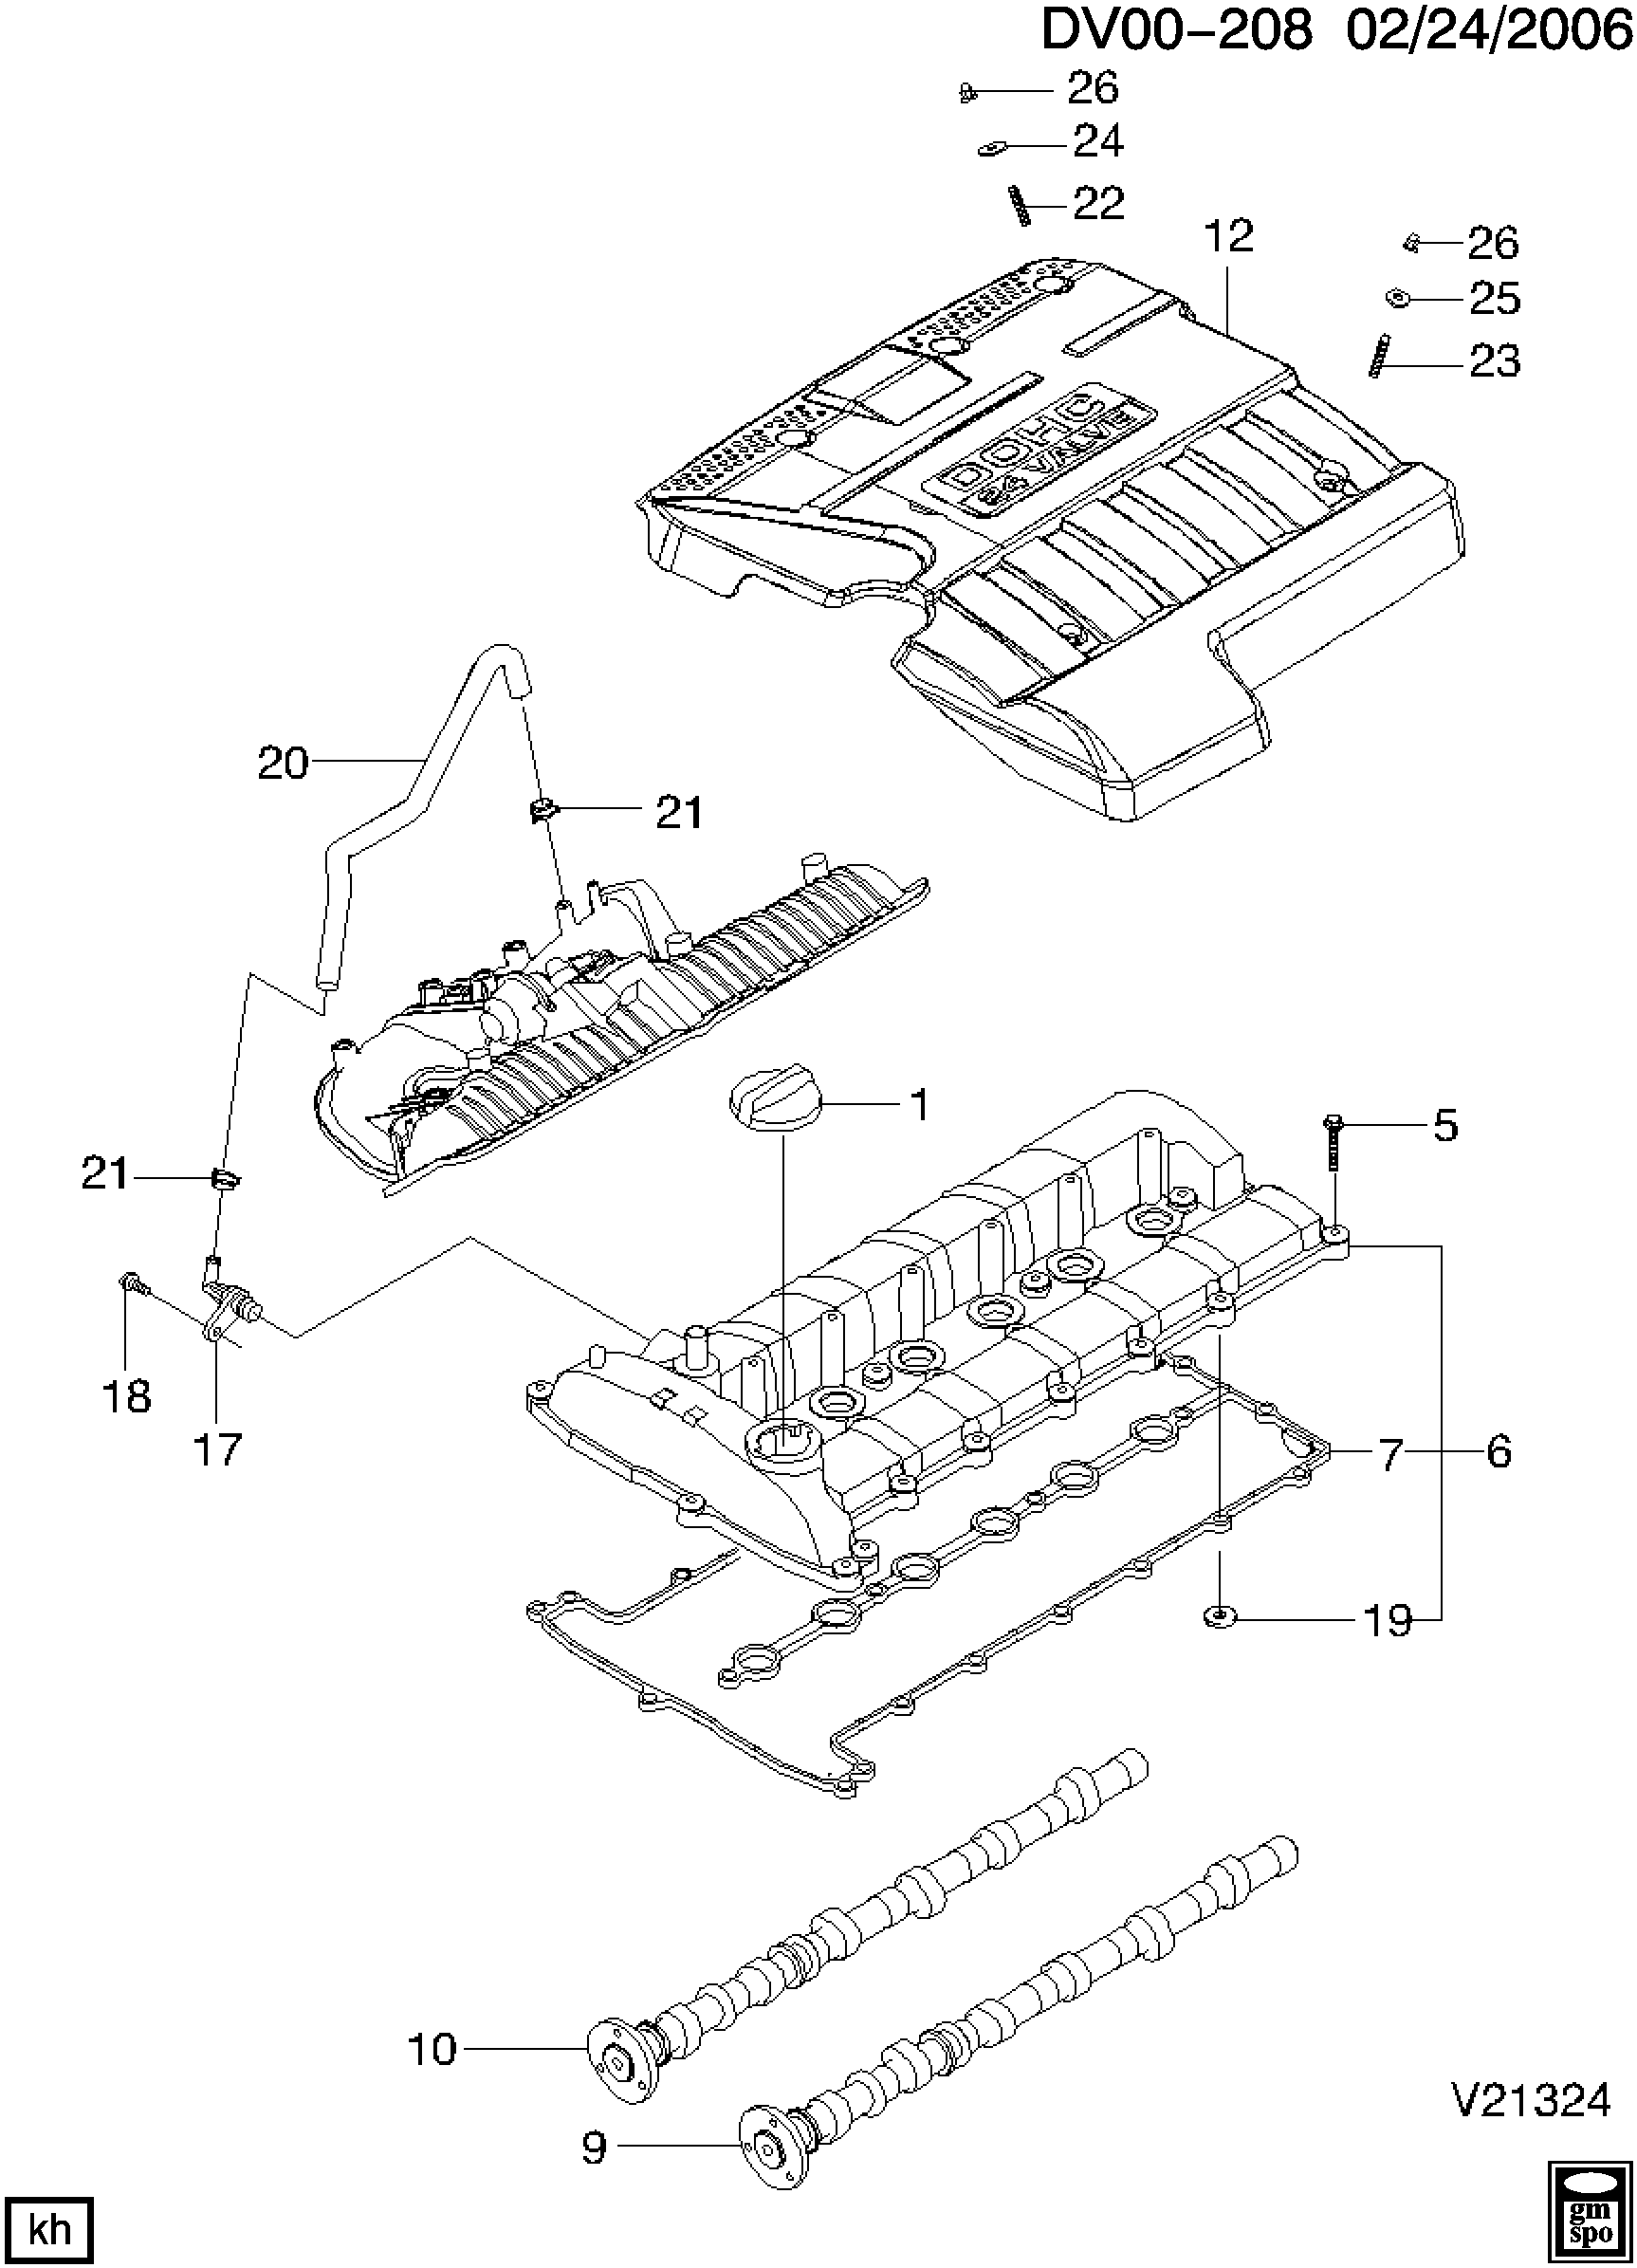 Chevrolet Gallery: Chevrolet Parts Catalog